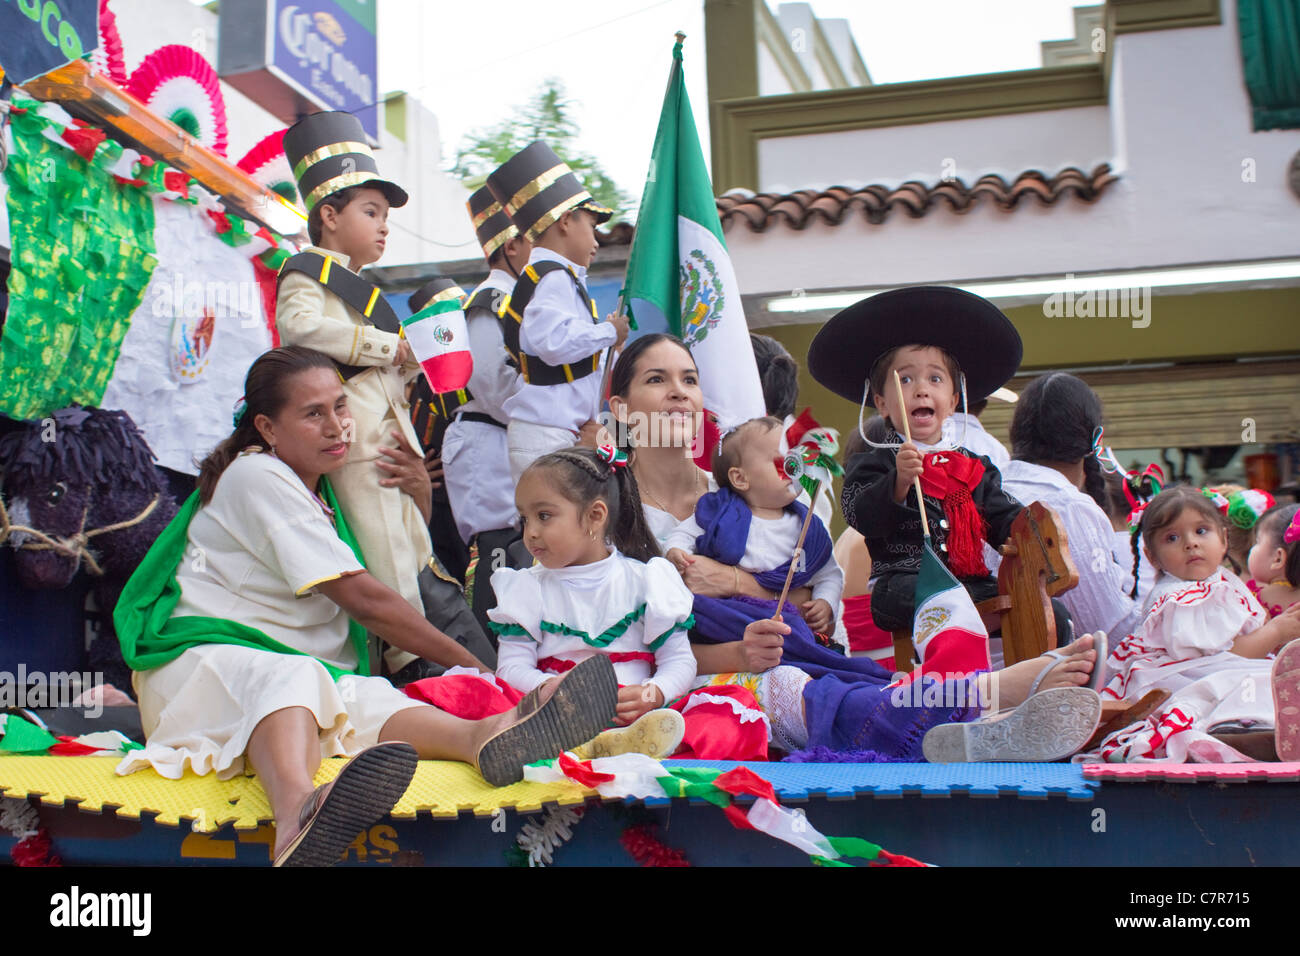 Mexikanische Unabhängigkeitstag (16. September) parade Float, Ajijic, Chapala, Jalisco, Mexiko. Stockbild